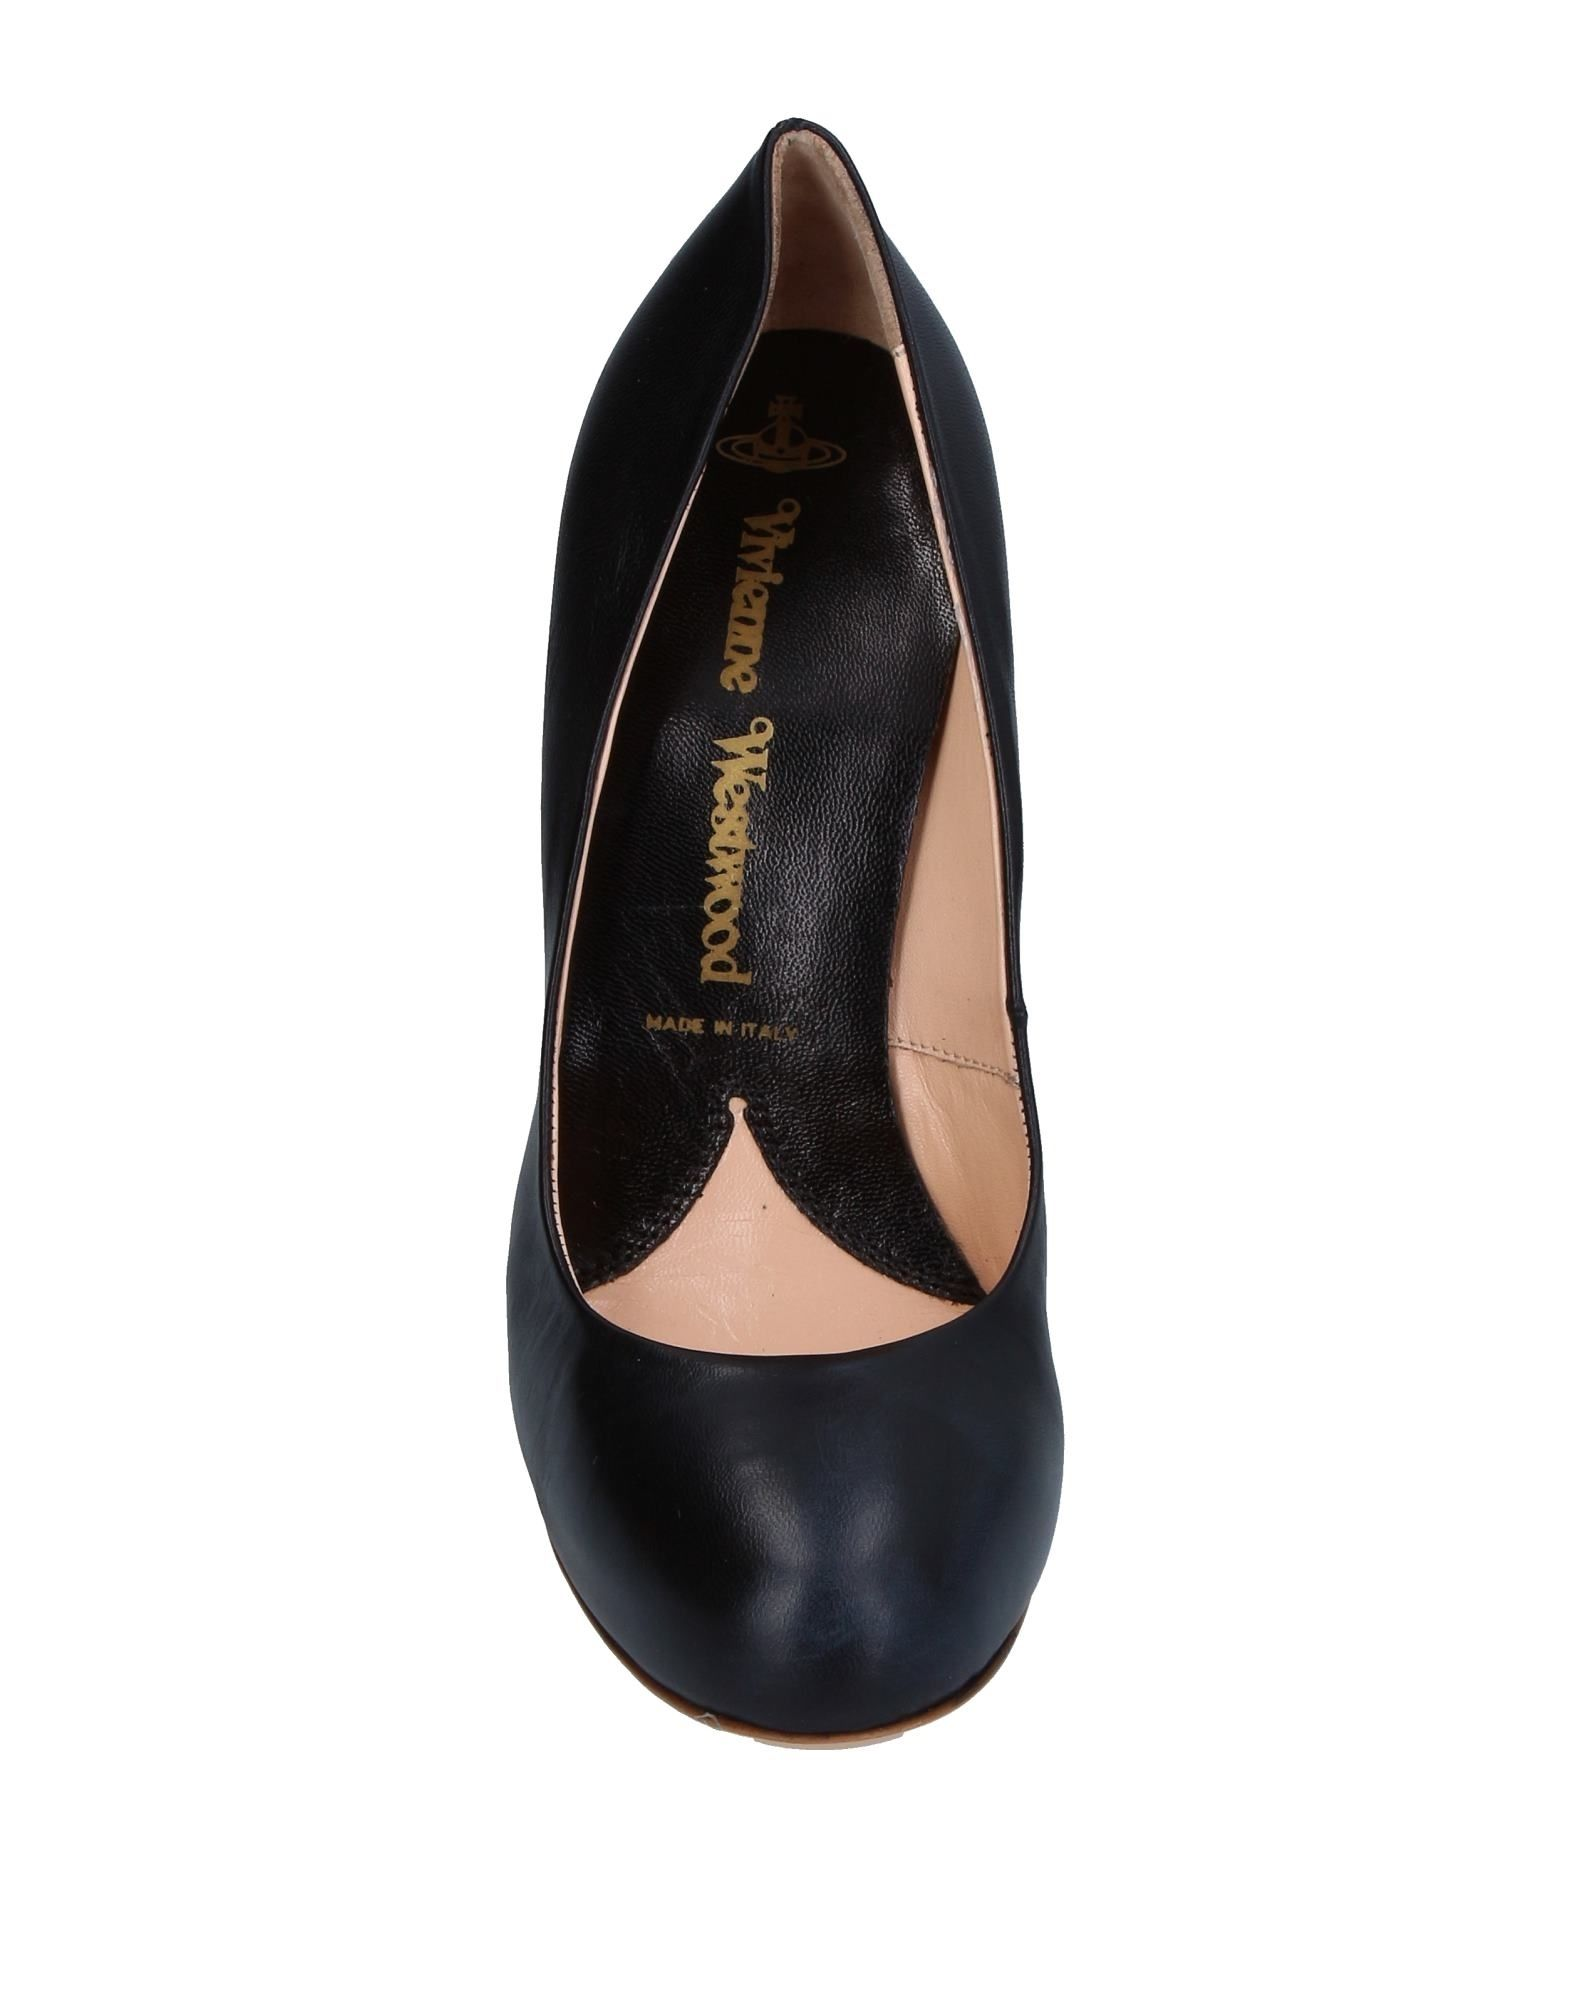 Stilvolle Westwood billige Schuhe Vivienne Westwood Stilvolle Pumps Damen  11371531VR c5ce73